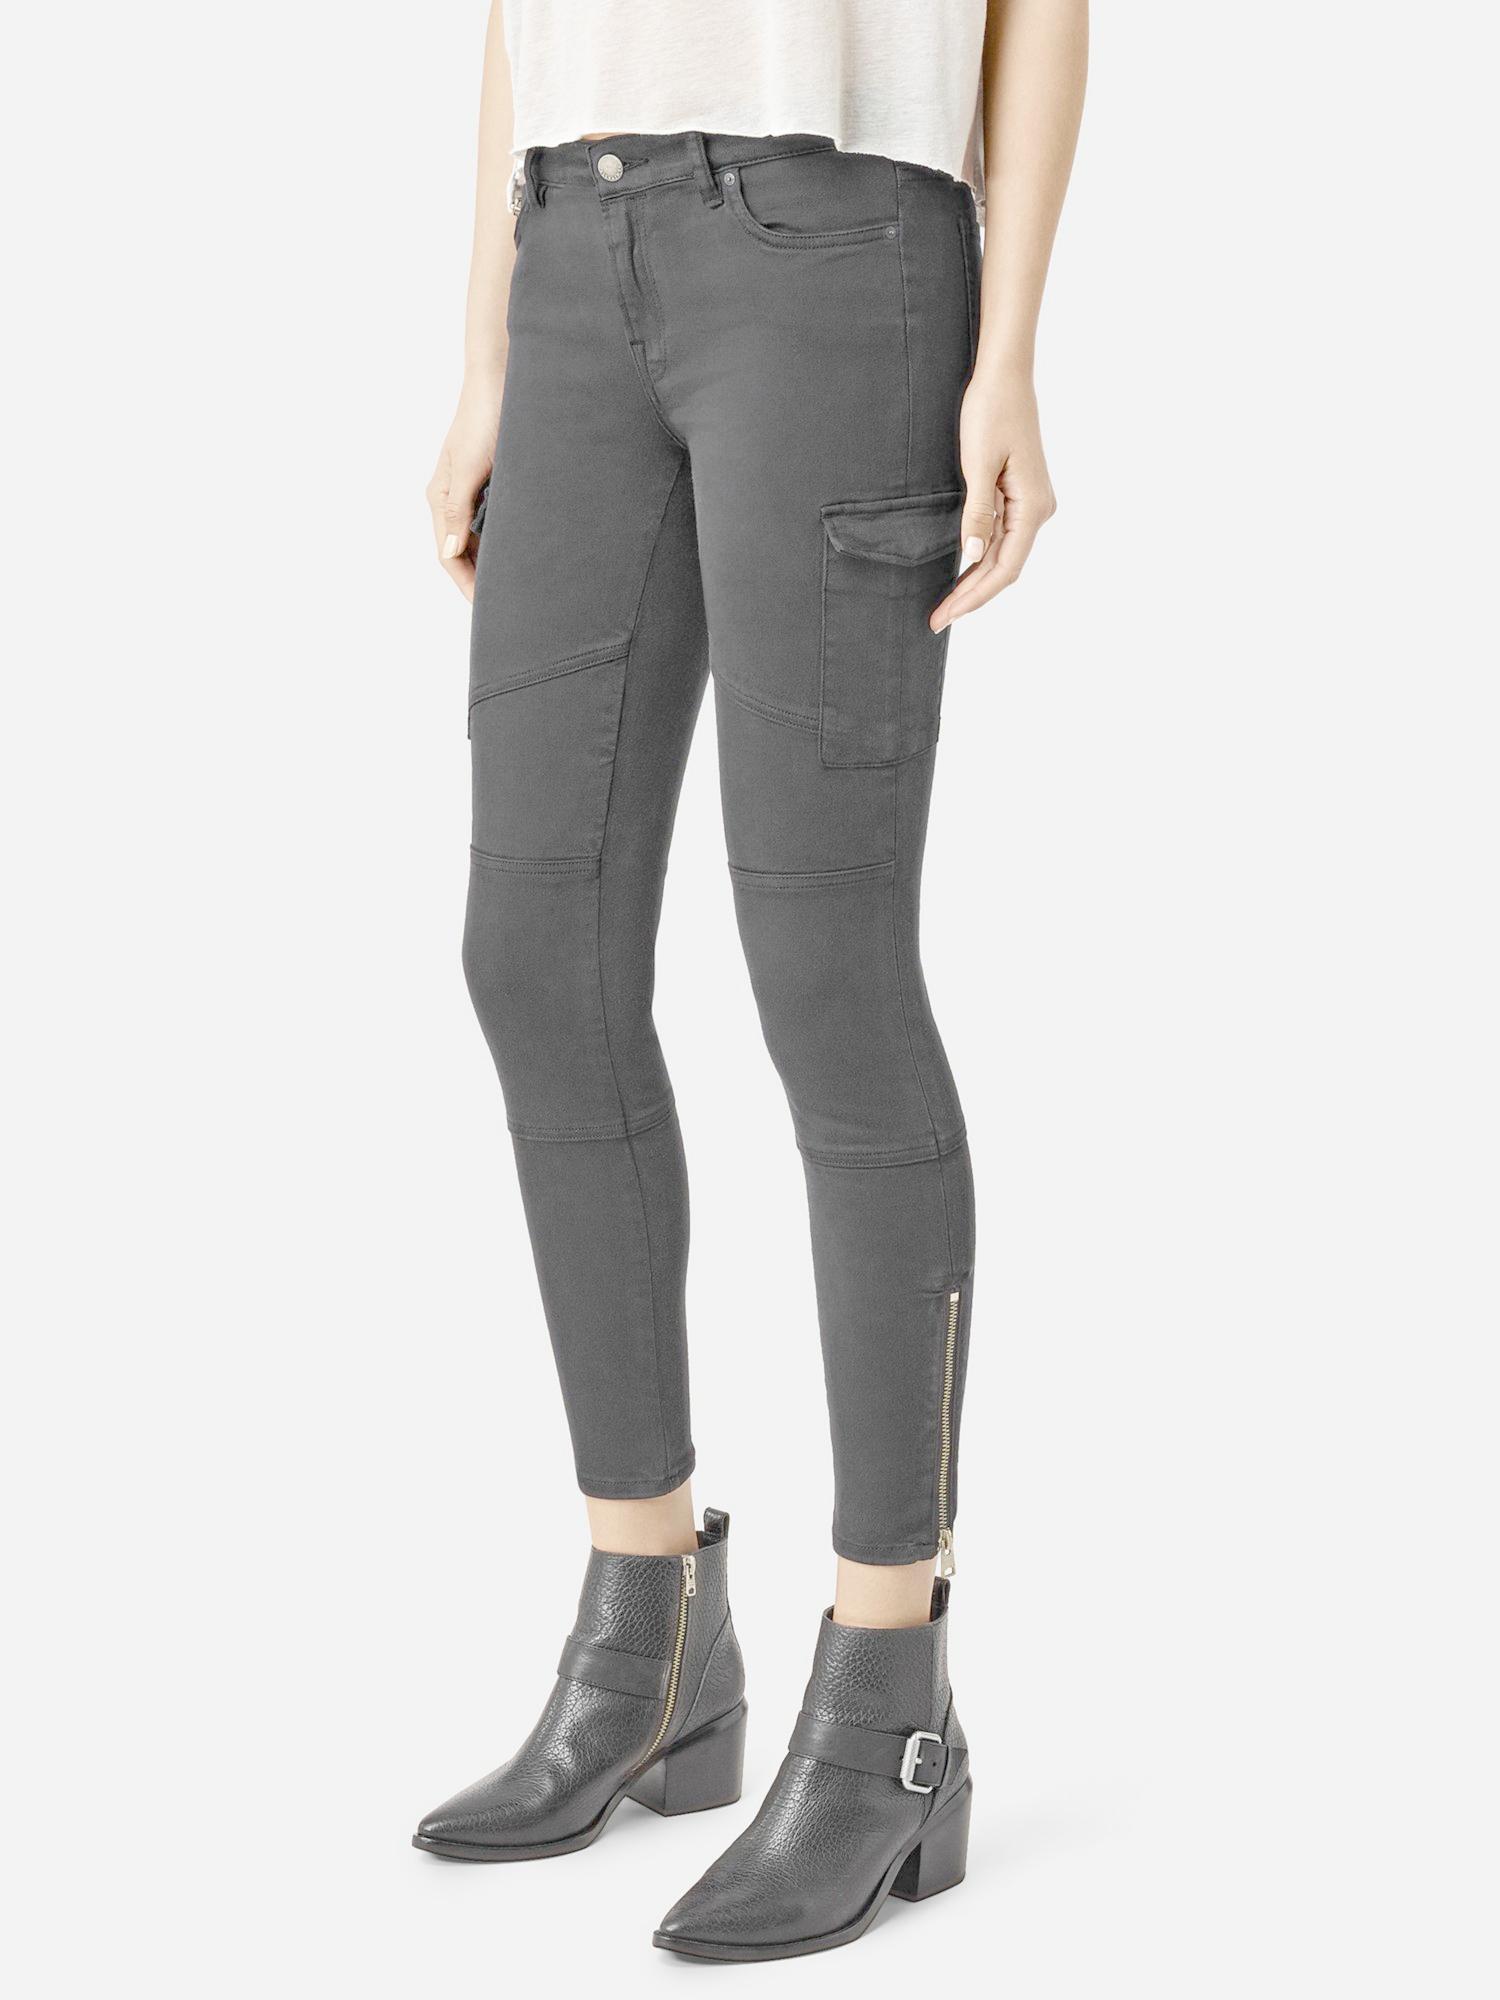 AllSaints Denim Gwen Skinny Cargo Jeans in Washed Black (Grey)